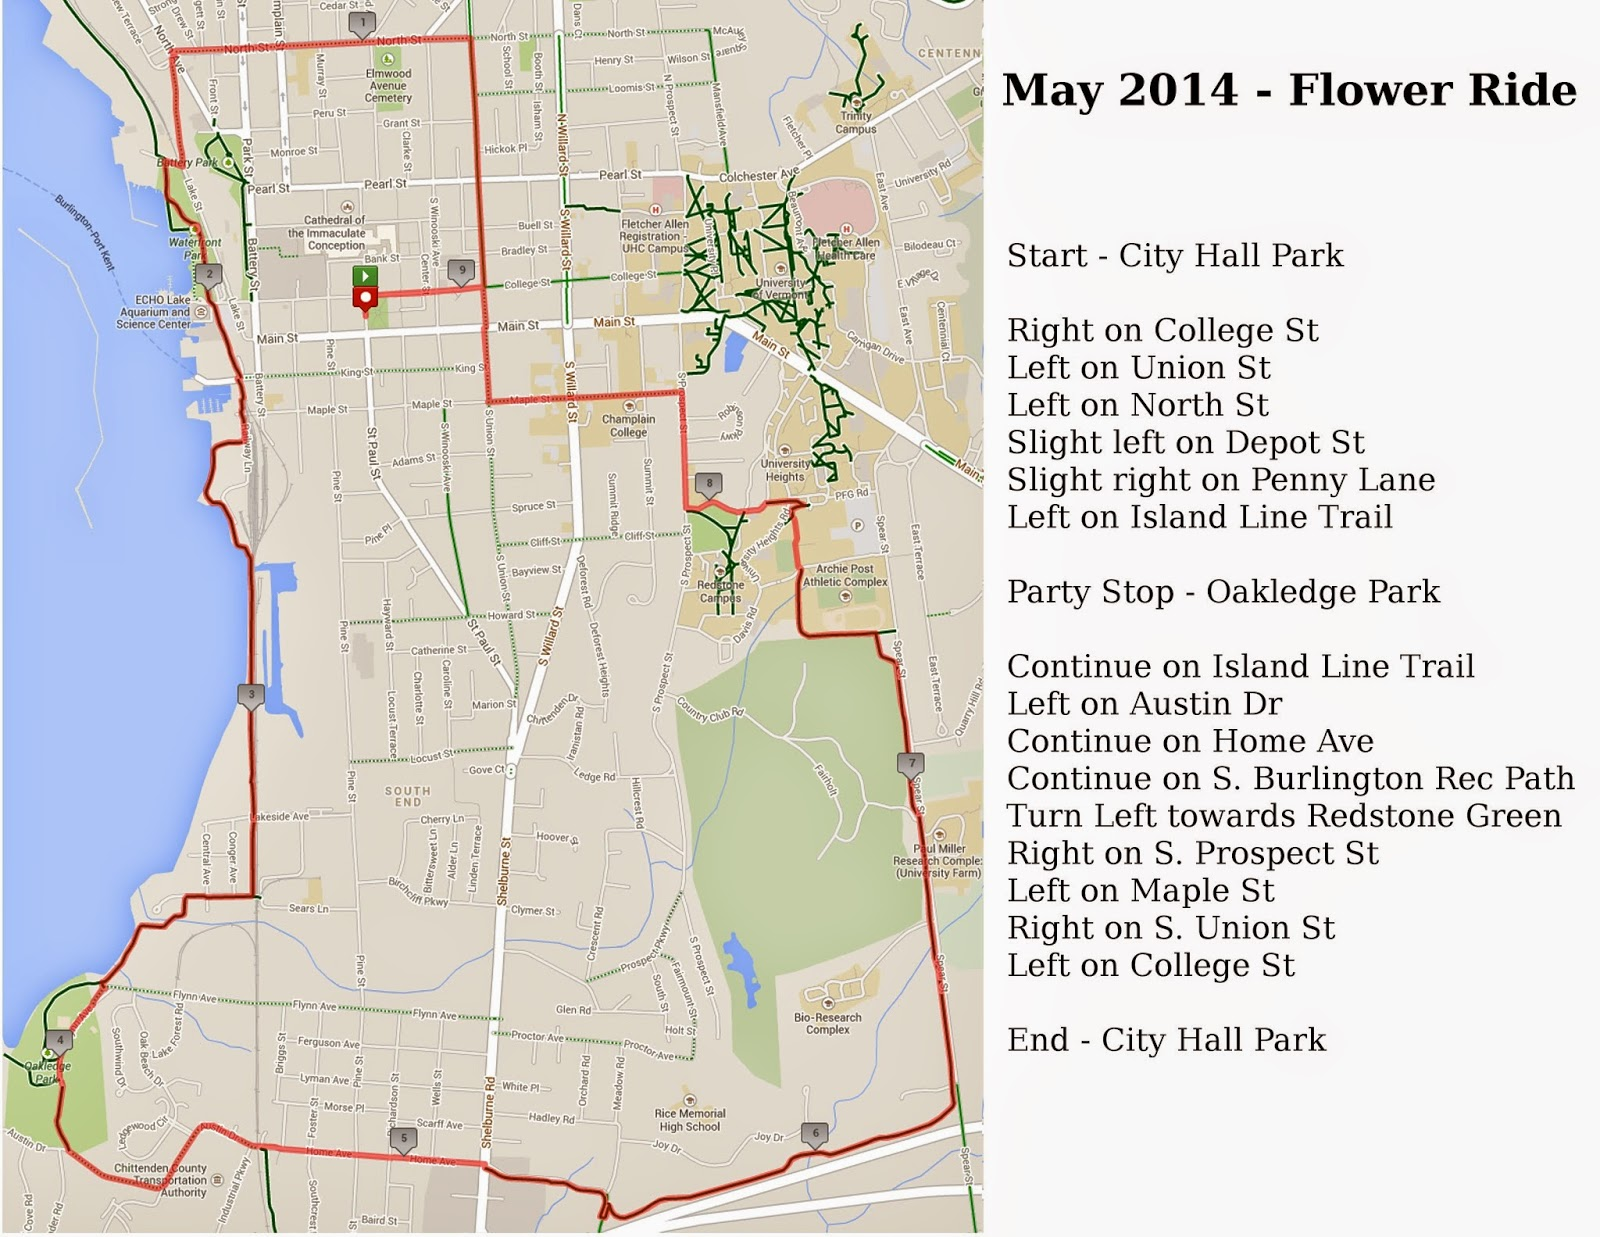 http://3.bp.blogspot.com/-VWv_cVCdtqA/U4attYrzaSI/AAAAAAAAATQ/0KeASSdoanA/s1600/2014_May-Flower_Ride.jpg